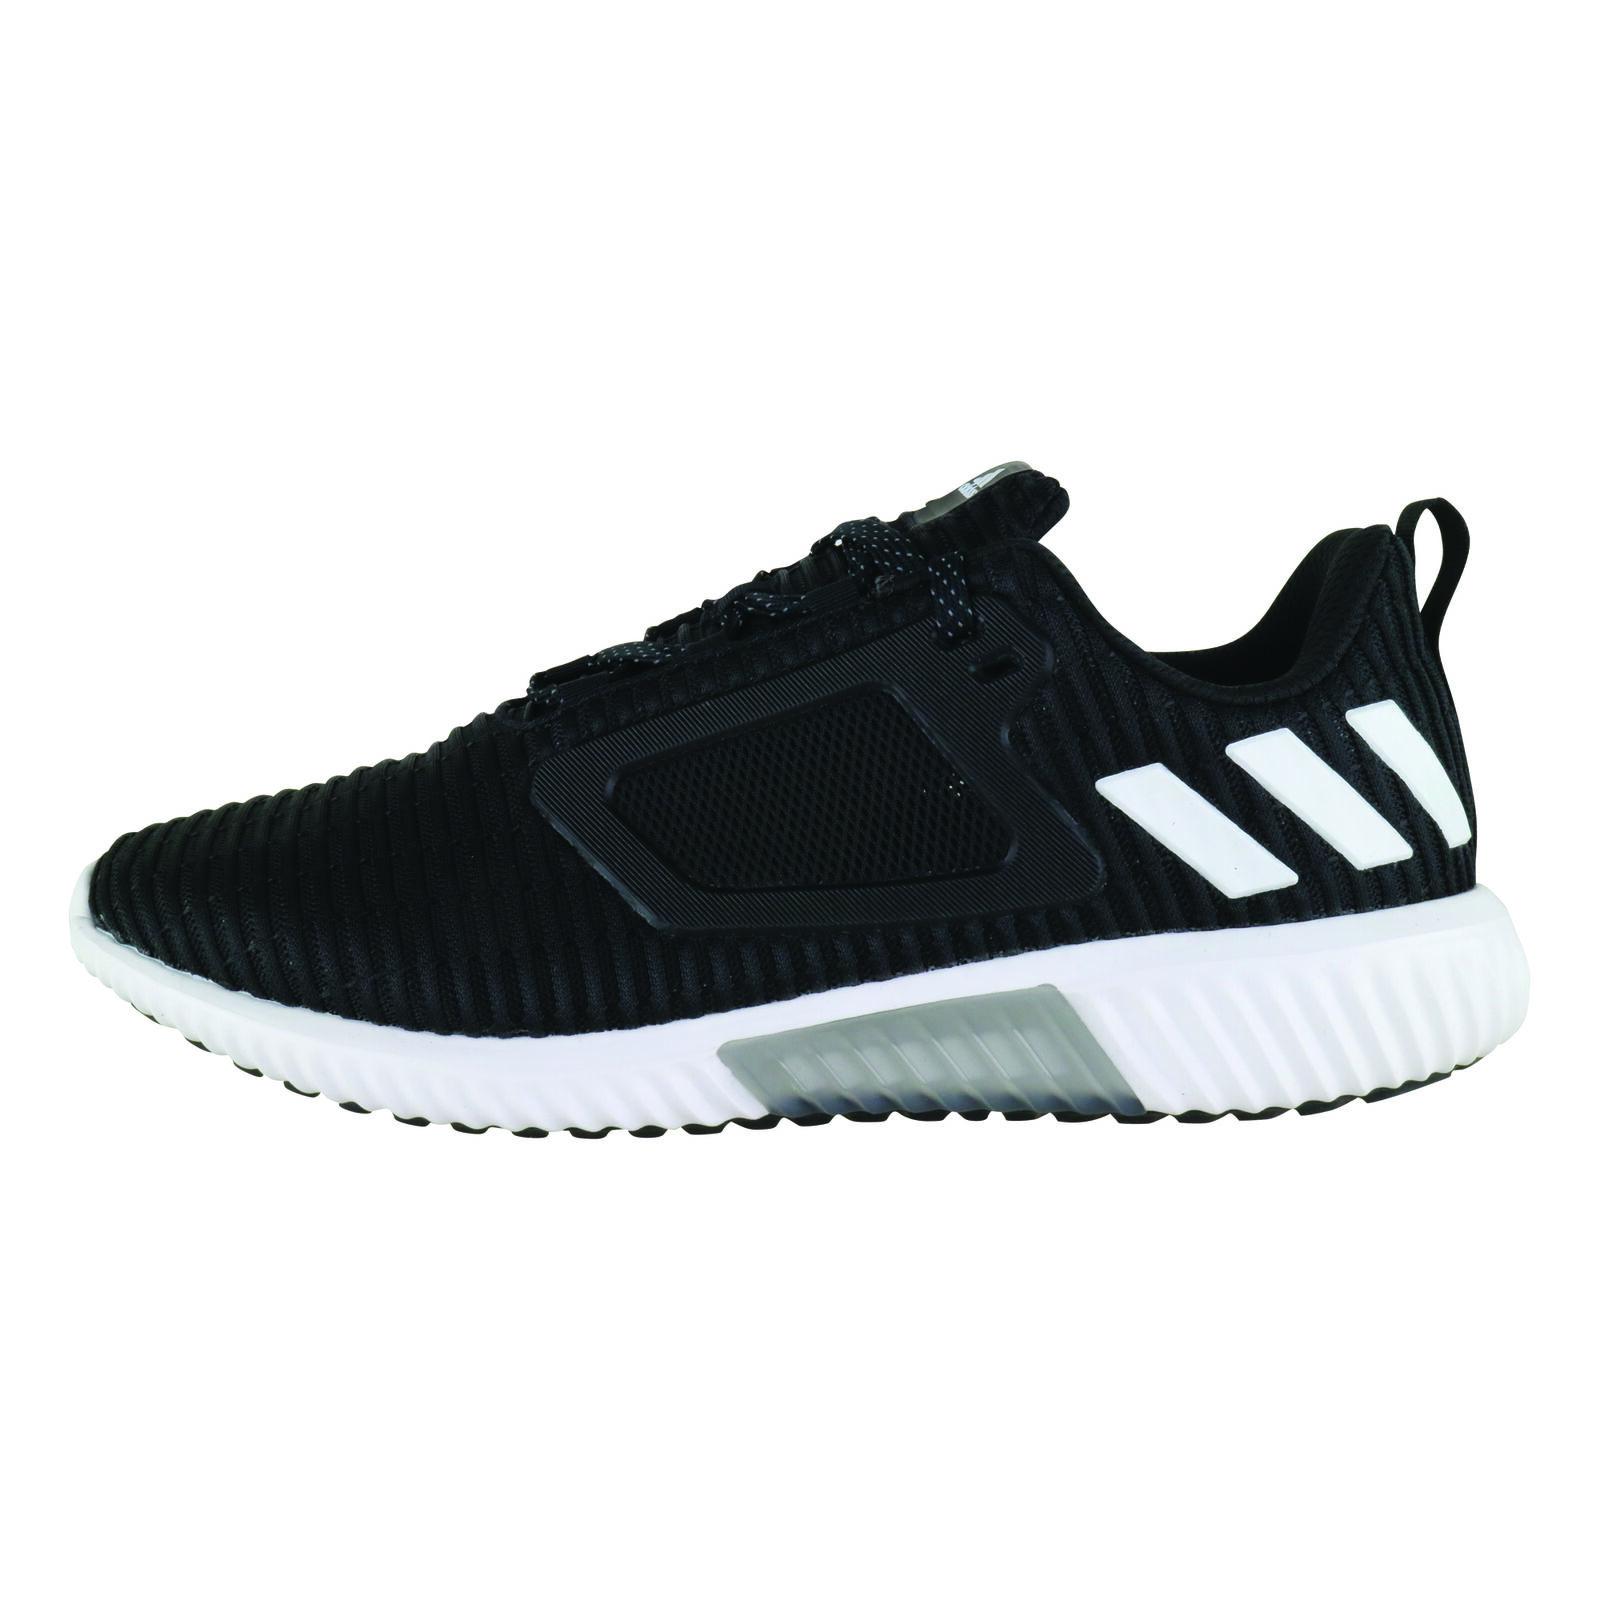 Adidas Climacool m negro blancoo cm7405